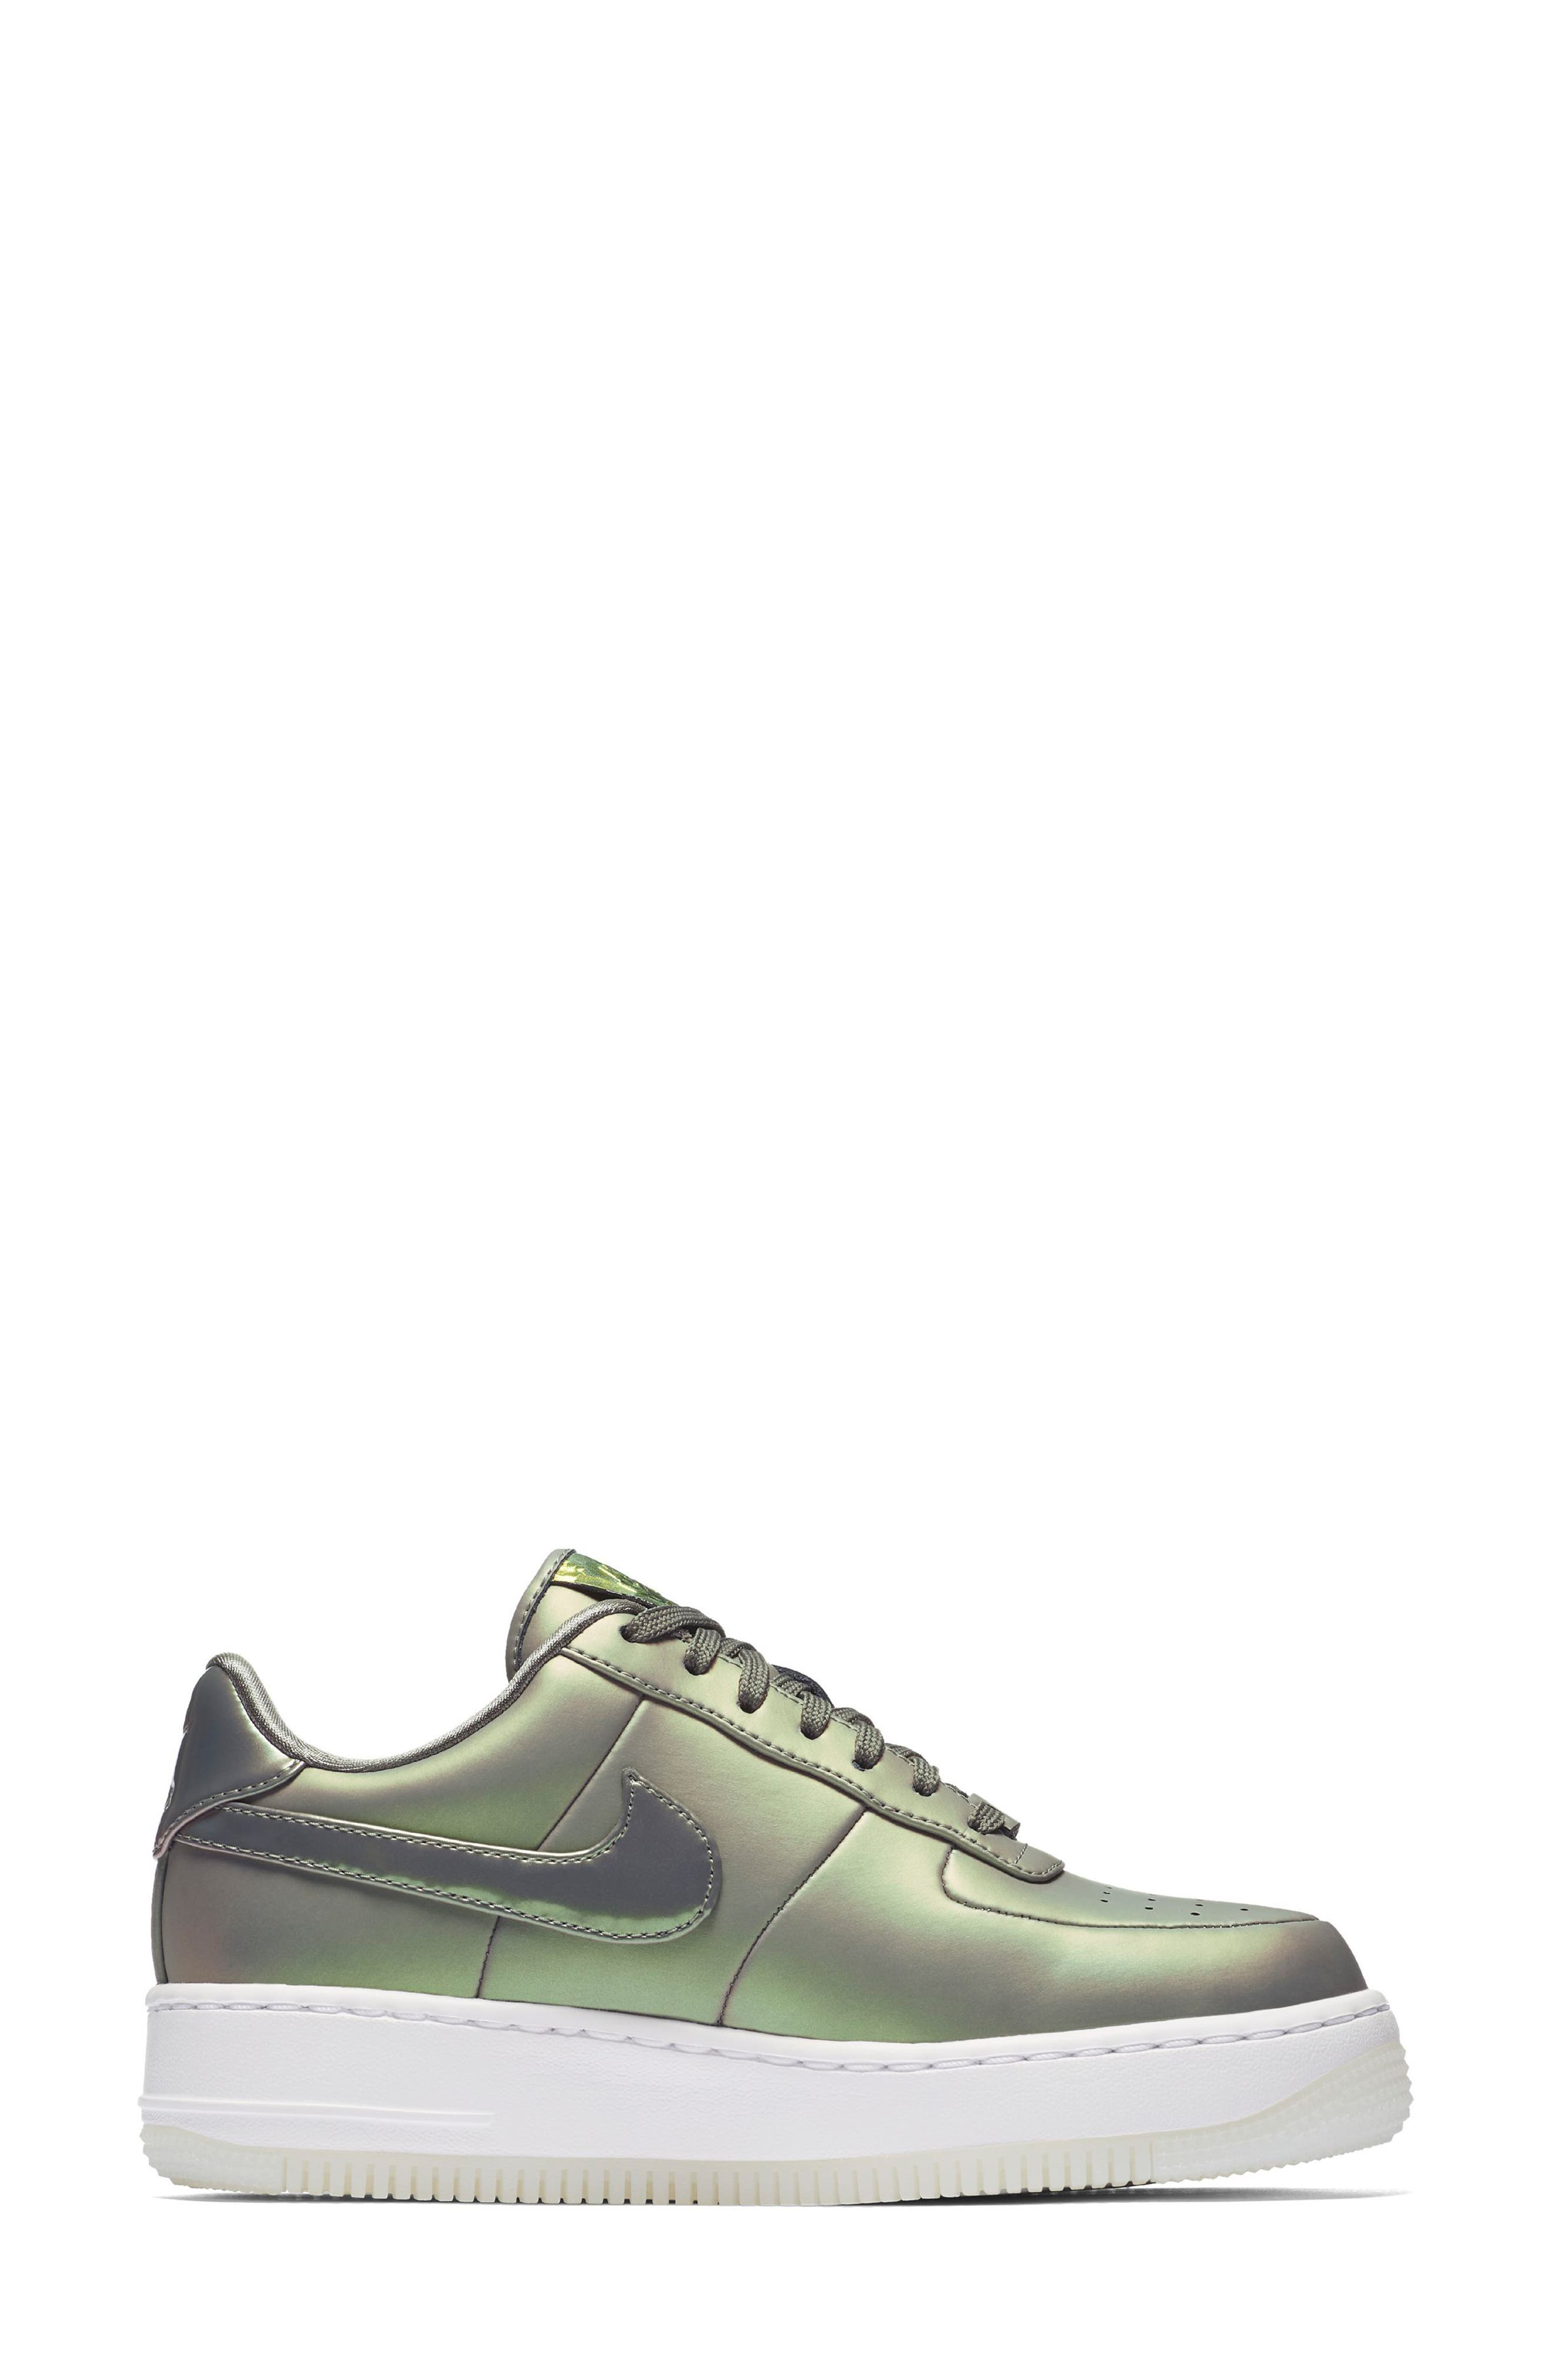 Air Force 1 Upstep Premium LX Shoe,                             Alternate thumbnail 5, color,                             Dark Stucco/ Stucco/ White